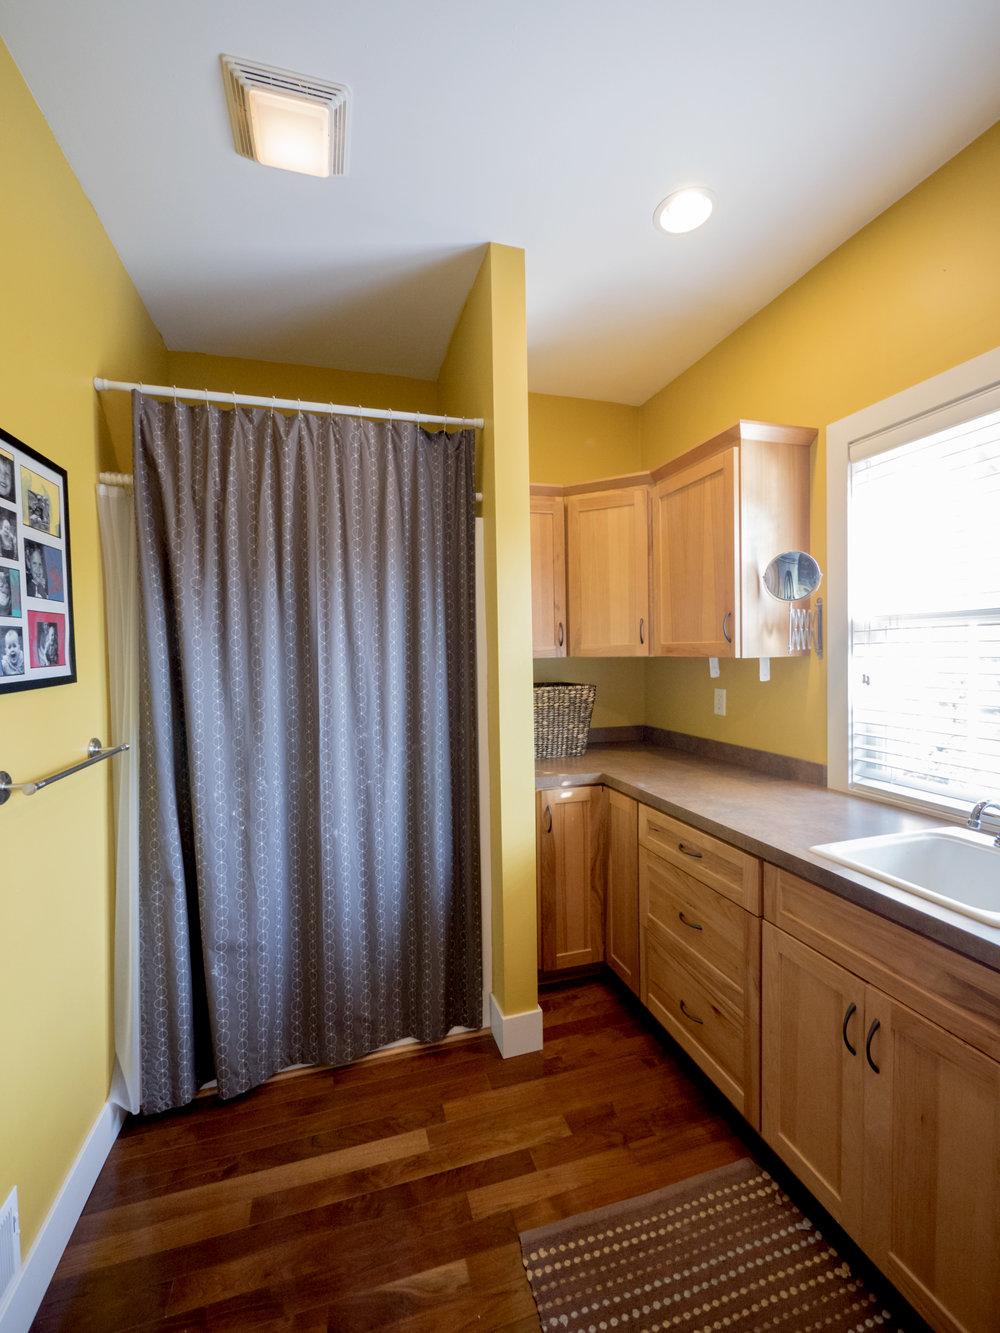 P1750620 laundry room.jpg